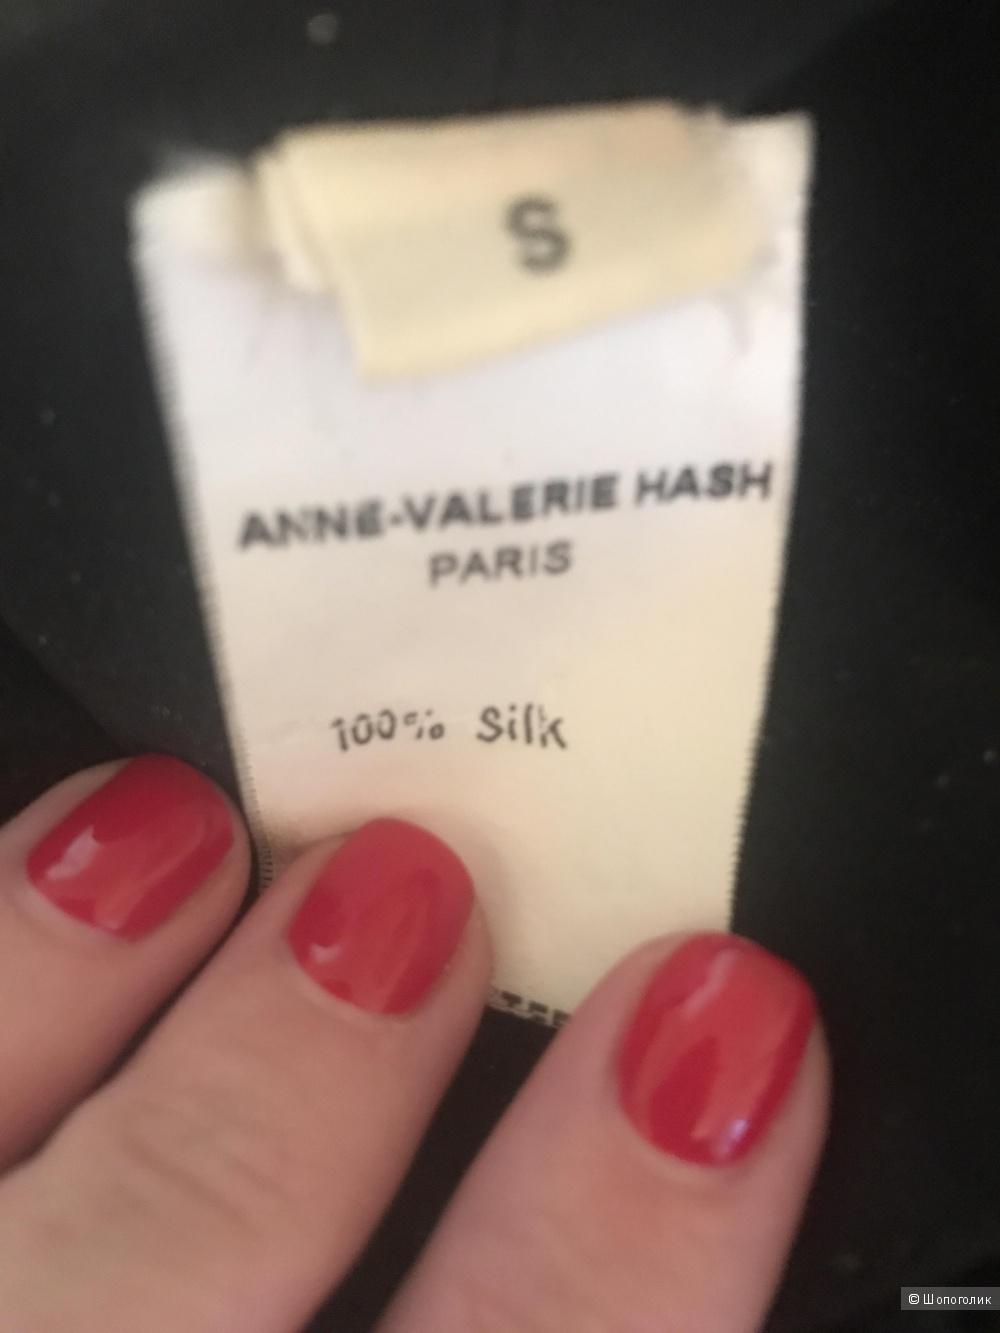 Платье Ann Valerie Hash, размер S.